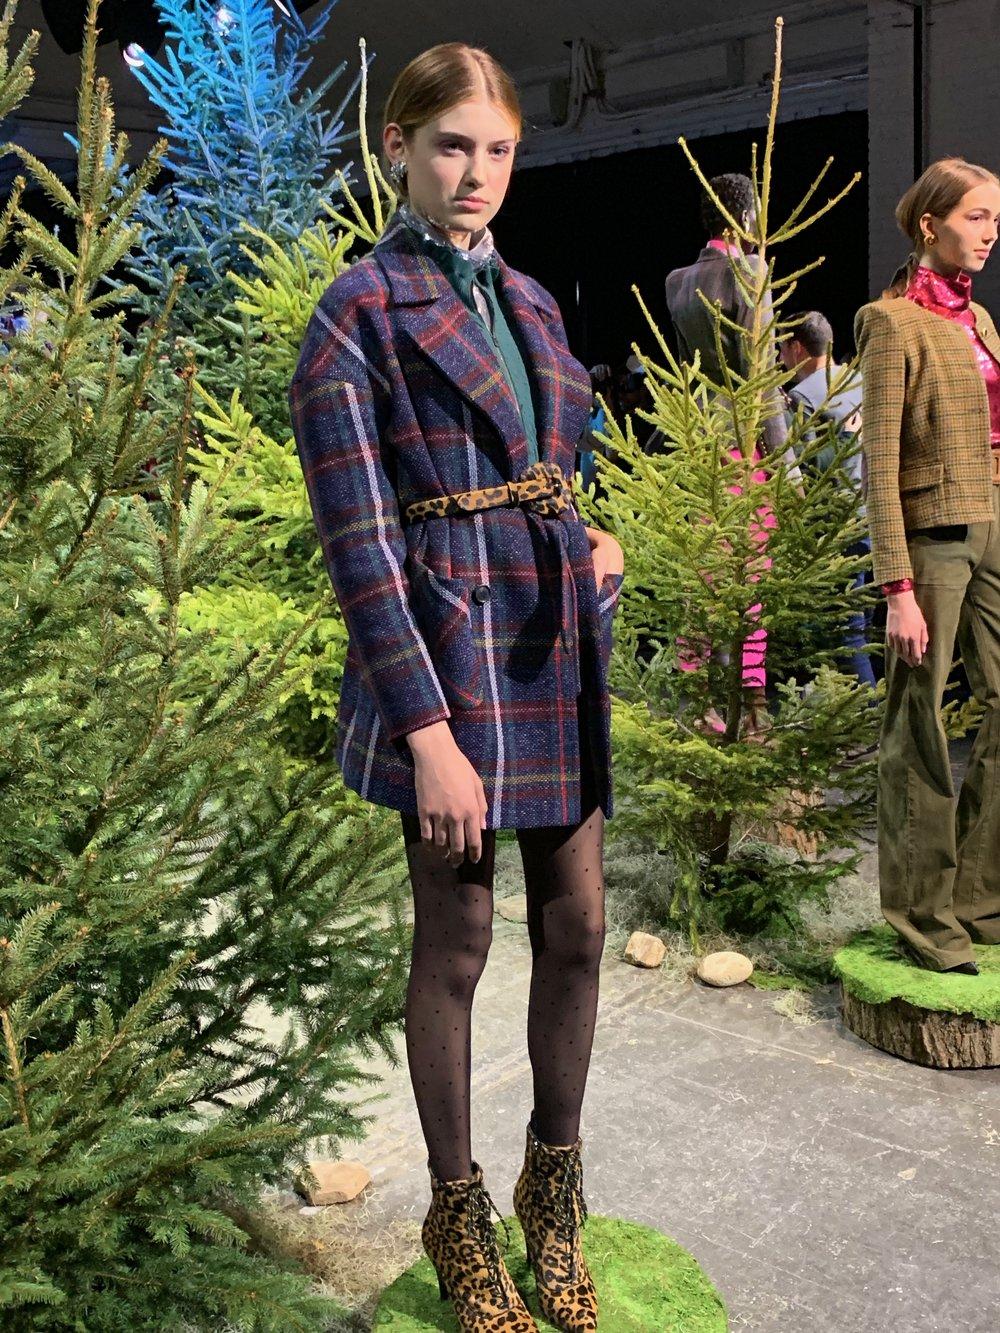 Model is wearing: Silver LUCINDA top, Green SILVI Sweater, Plaid MICHEL Short, Plaid PHILLIPS Dickey Coat, Leopard ELSY Belt, Leopard PAULA Boots